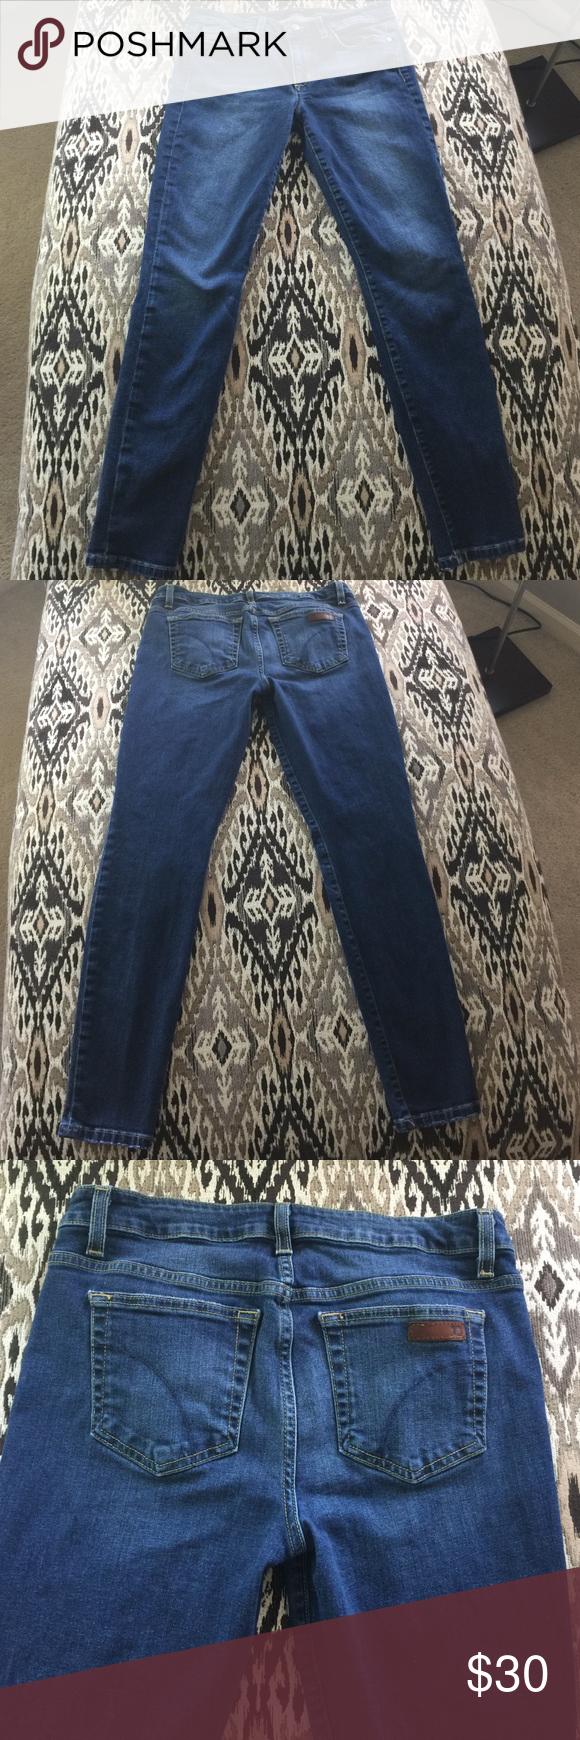 Joe's Skinny Jeans - Size 29 Like new Joe's skinny jeans.  Worn once.  98% cotton/2% Lycra. Joe's Jeans Jeans Skinny